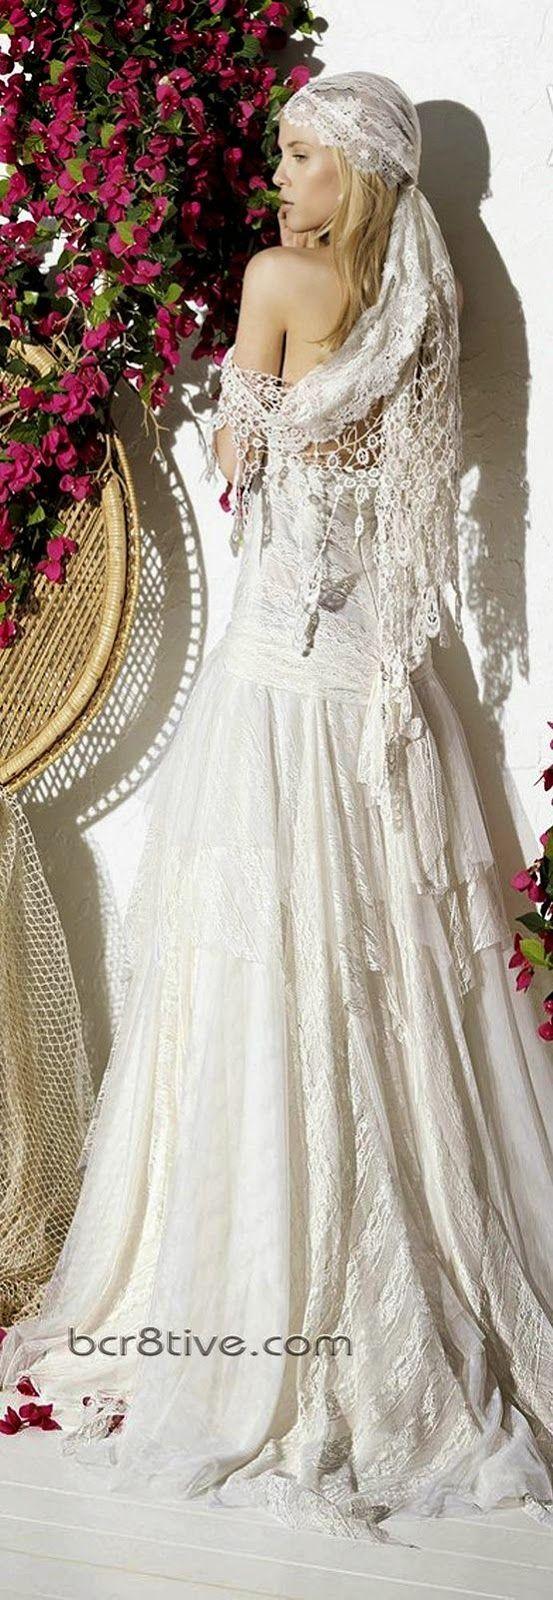 Adorable boho bride wedding pinterest boho wedding dress and